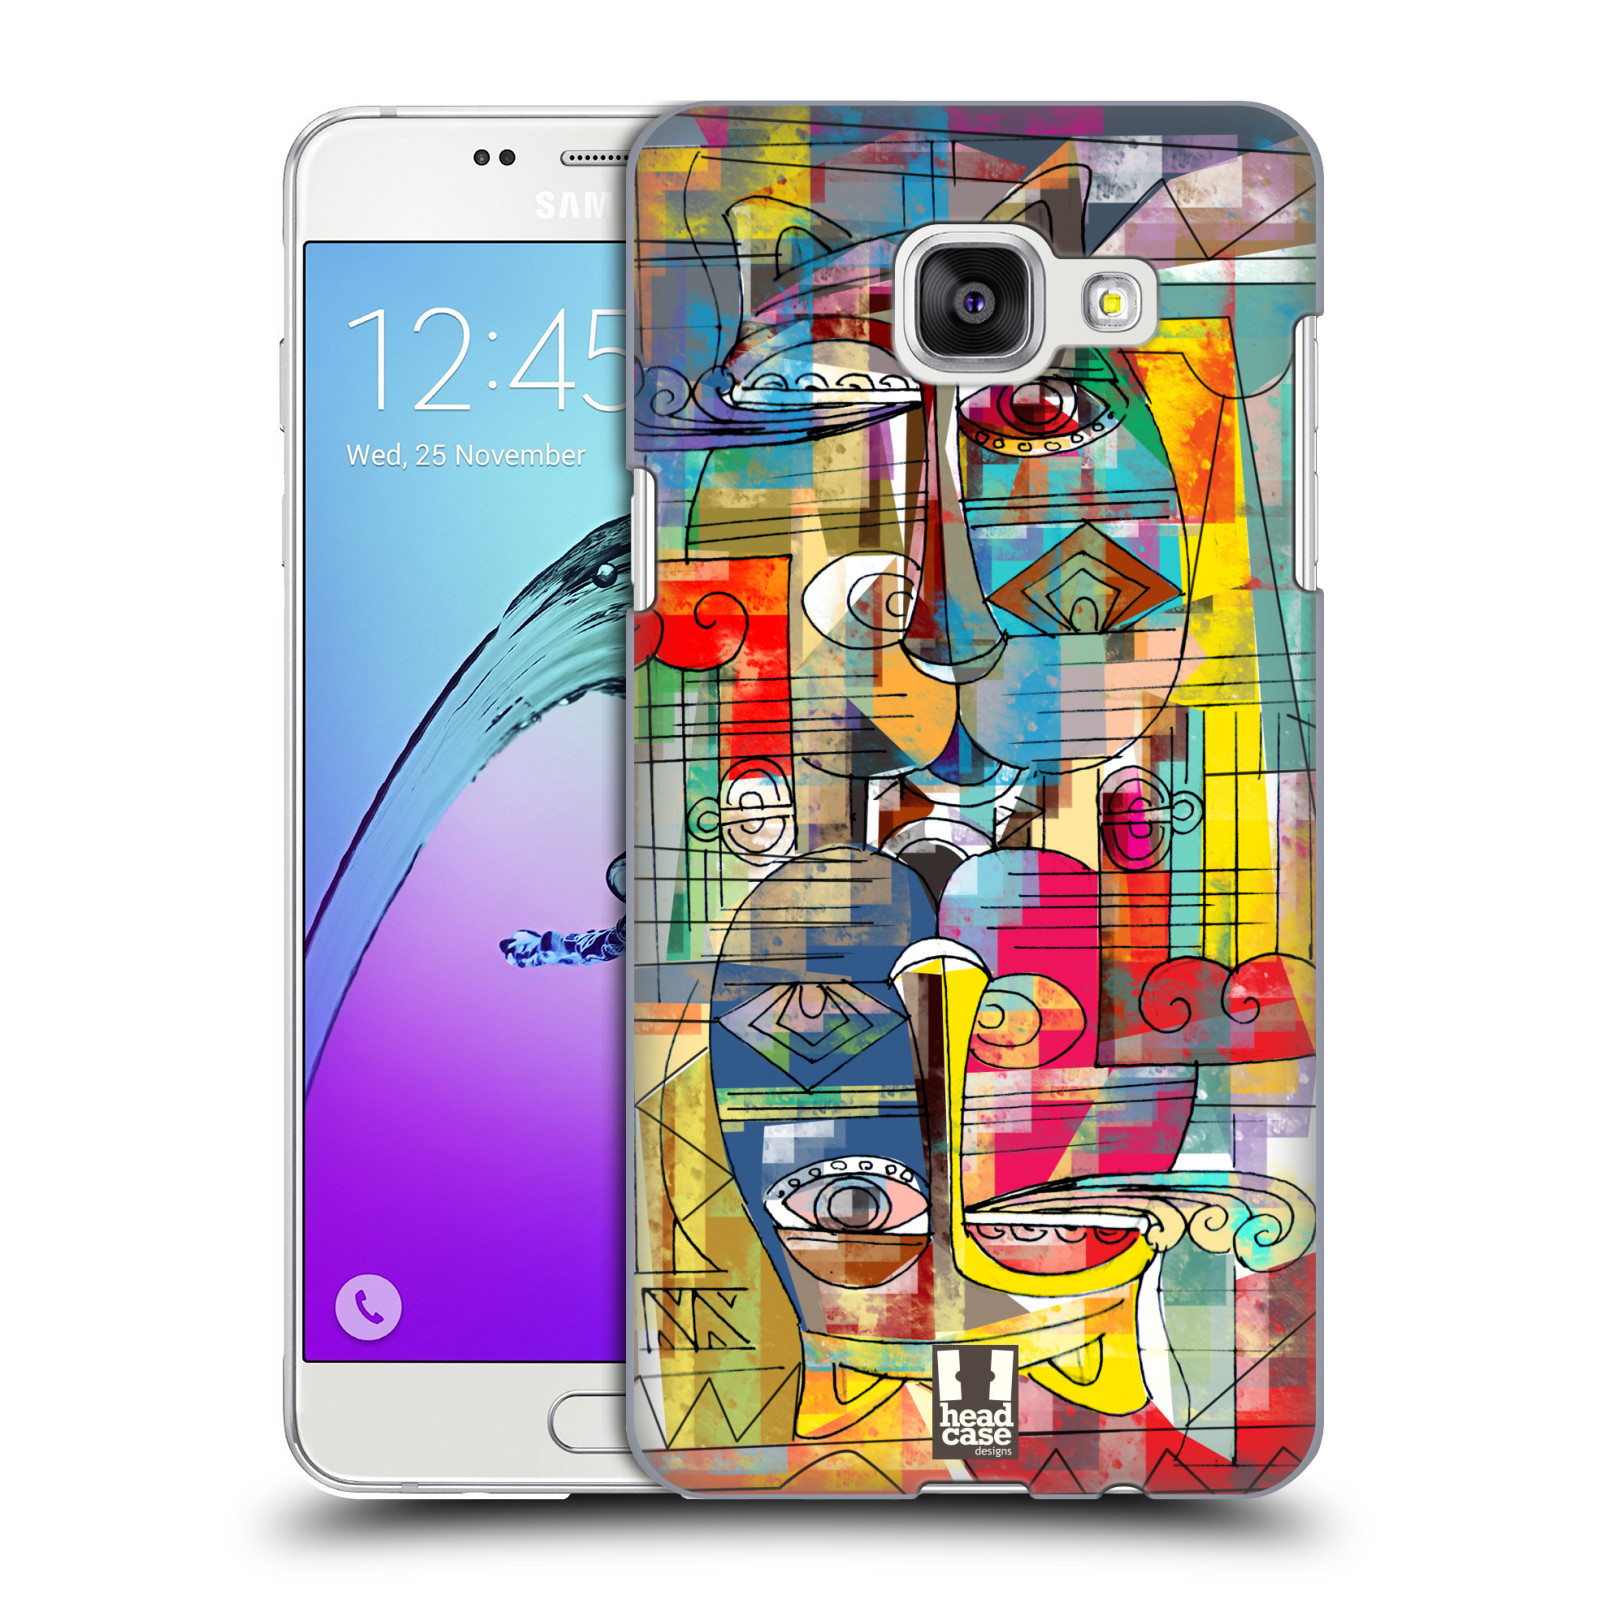 Plastové pouzdro na mobil Samsung Galaxy A5 (2016) HEAD CASE AZTEC MANX